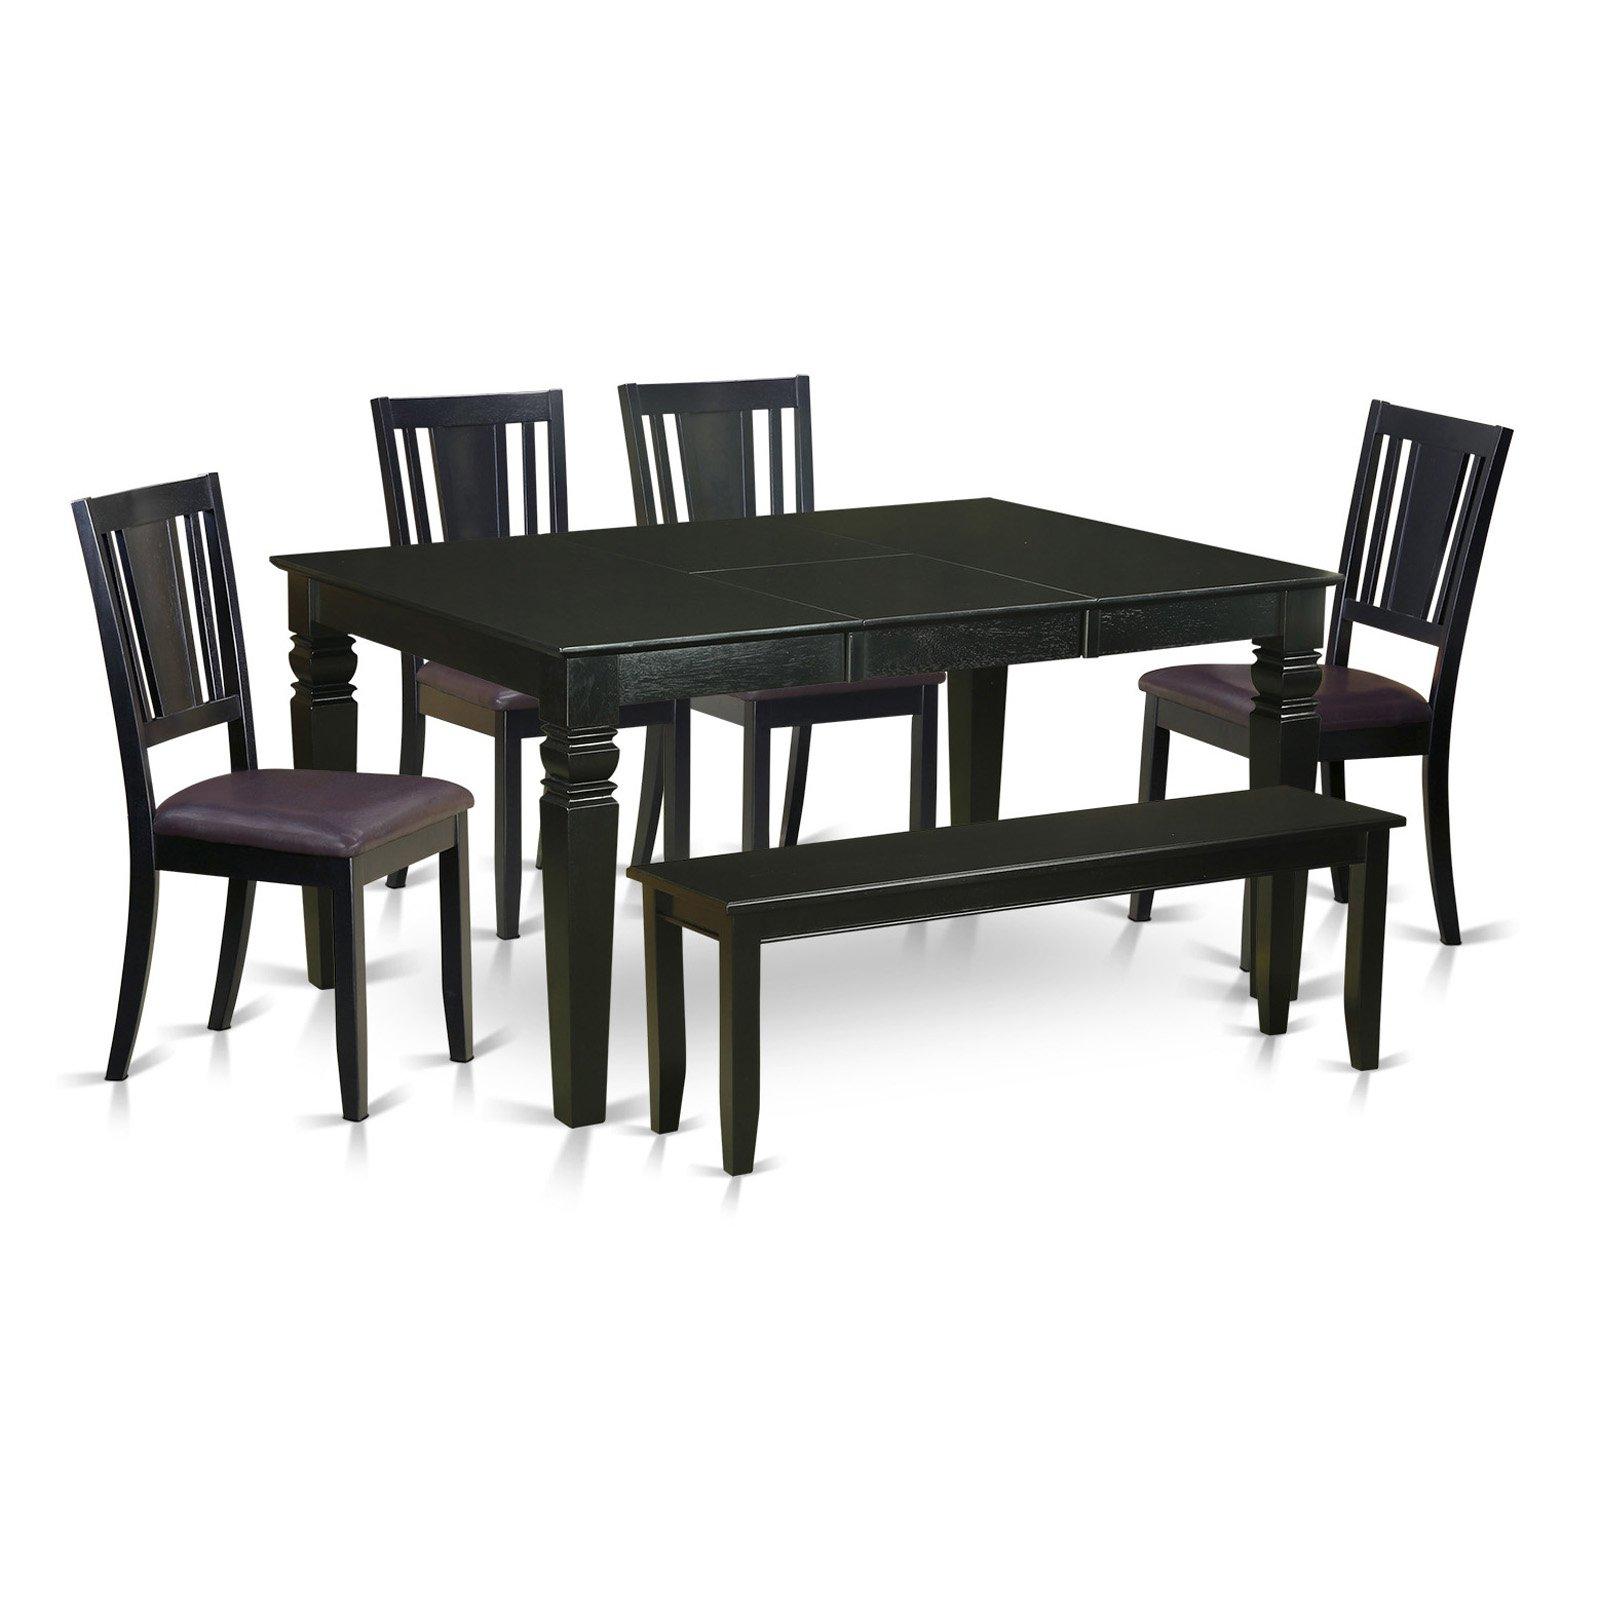 East West Furniture Weston 6 Piece Scotch Art Dining Table Set